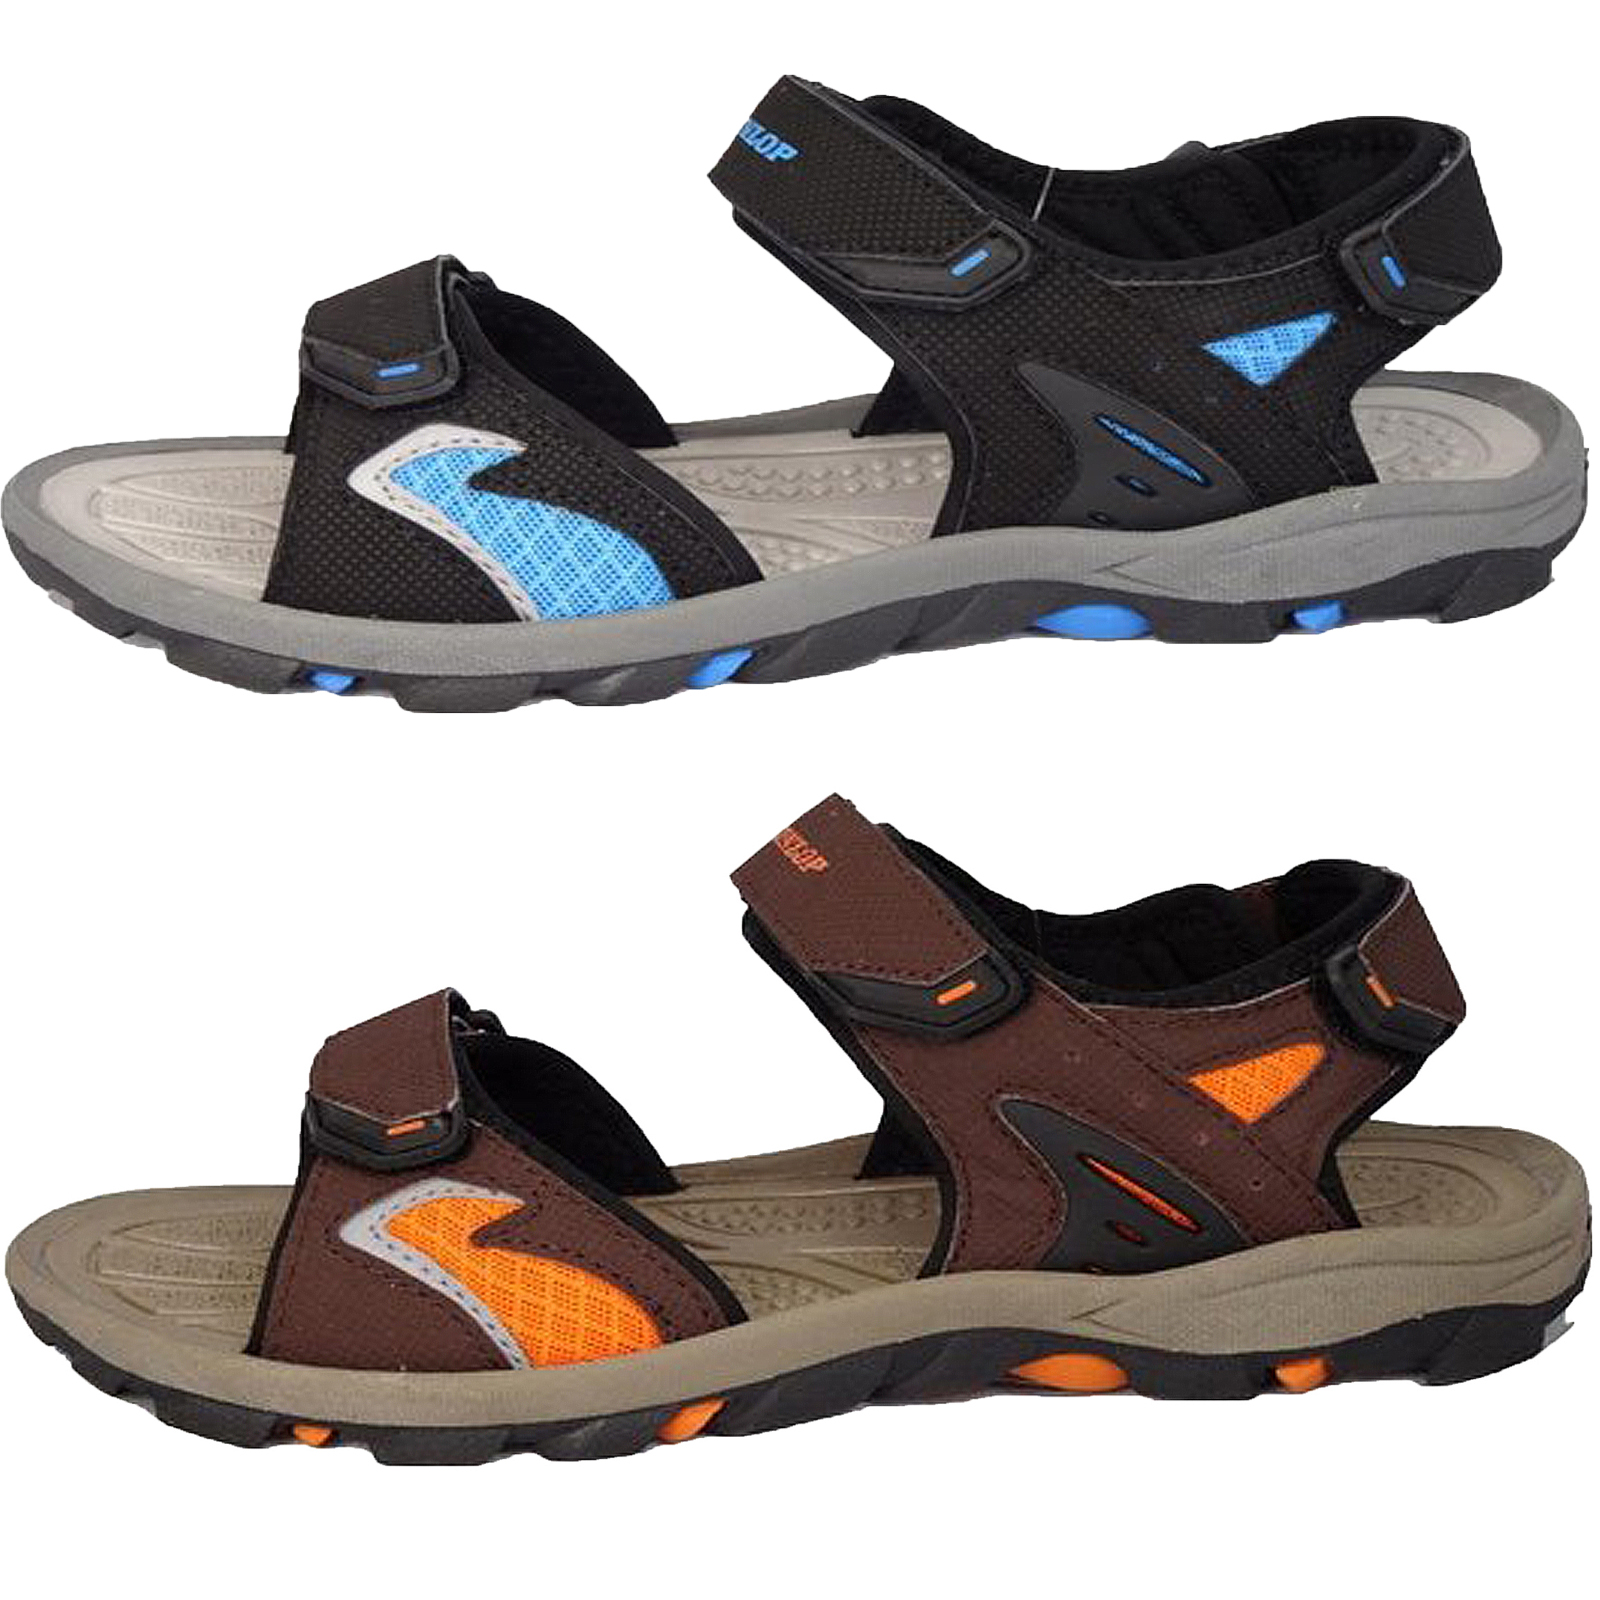 Uomo Sandali sportivi DUNLOP DUE BARRA trekking scarpe vacanza in spiaggia